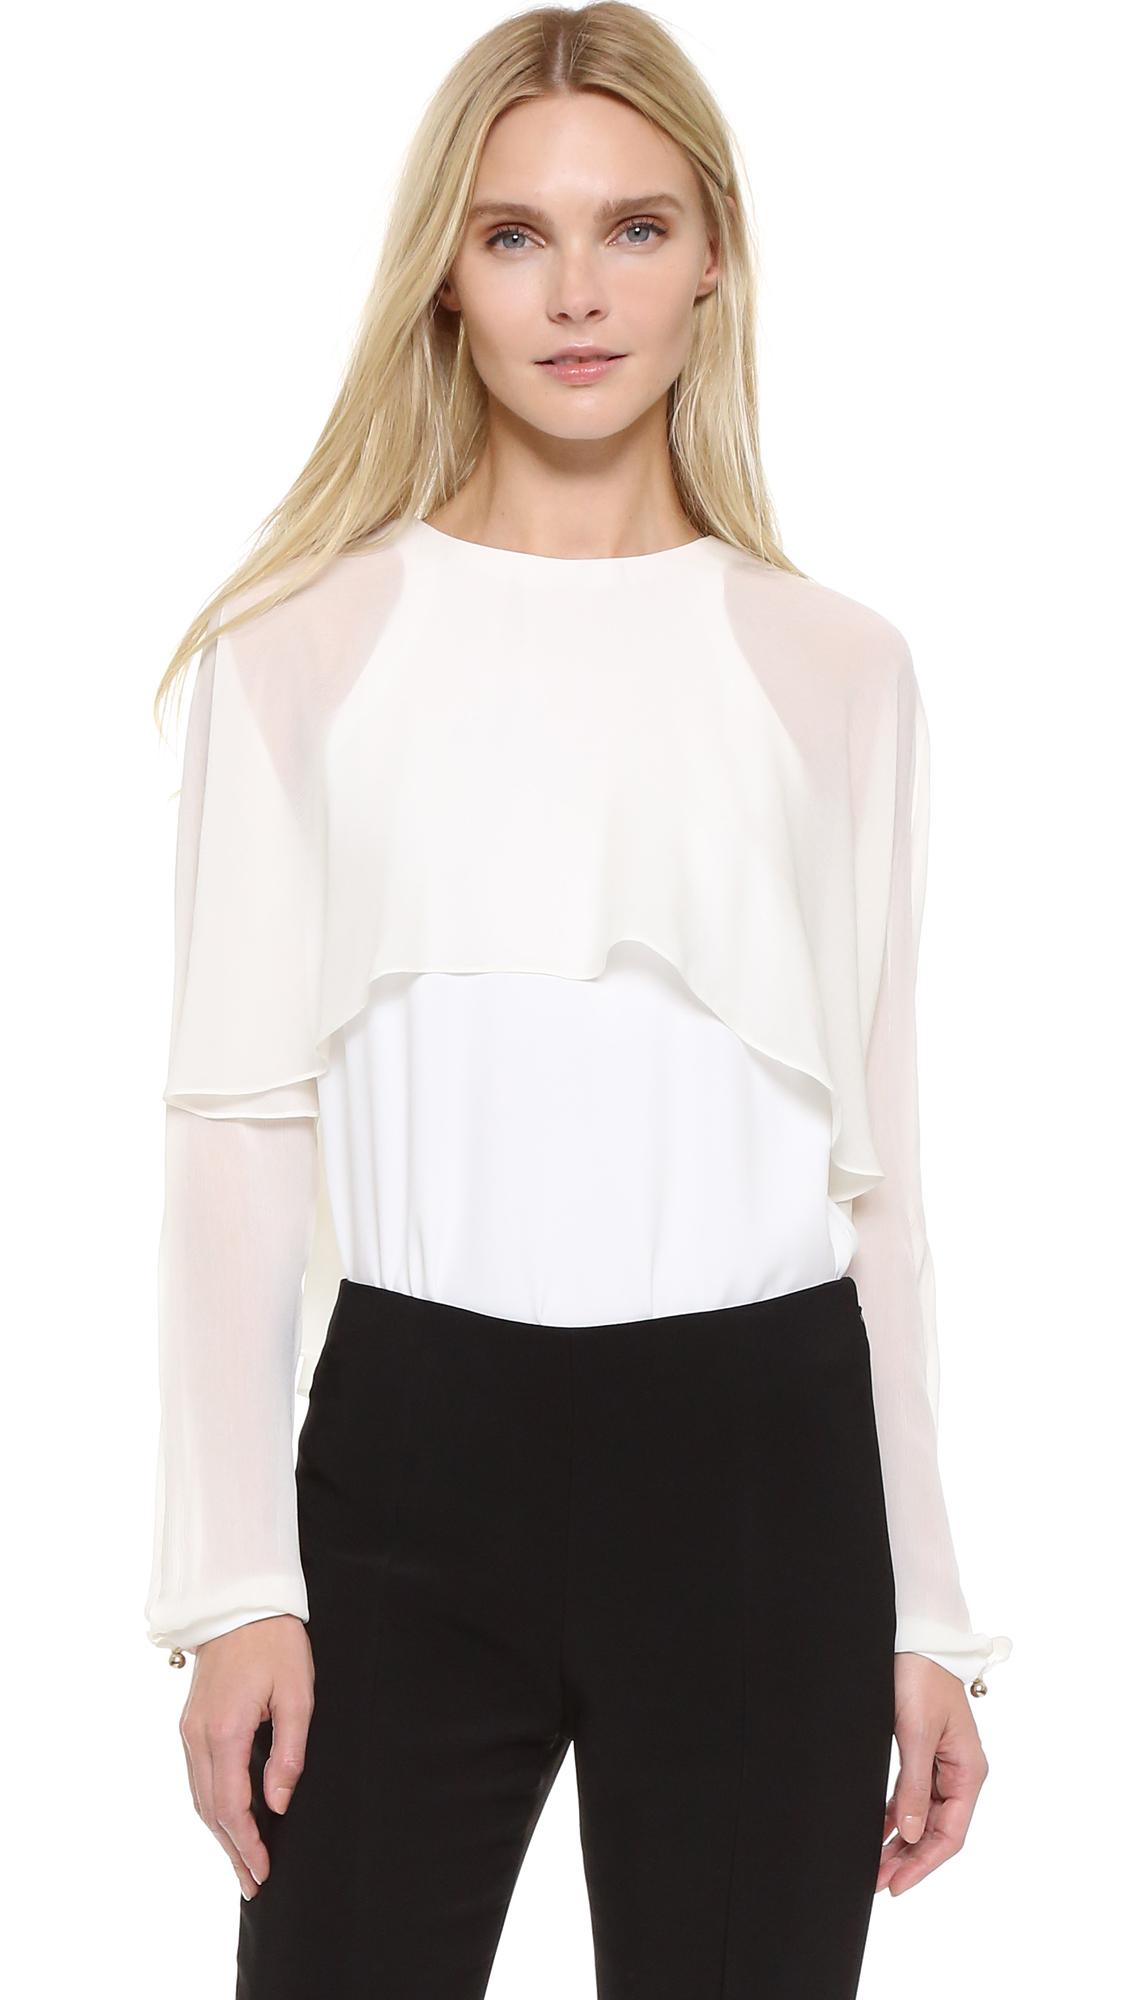 Antonio Berardi Long Sleeve Blouse - Off White at Shopbop